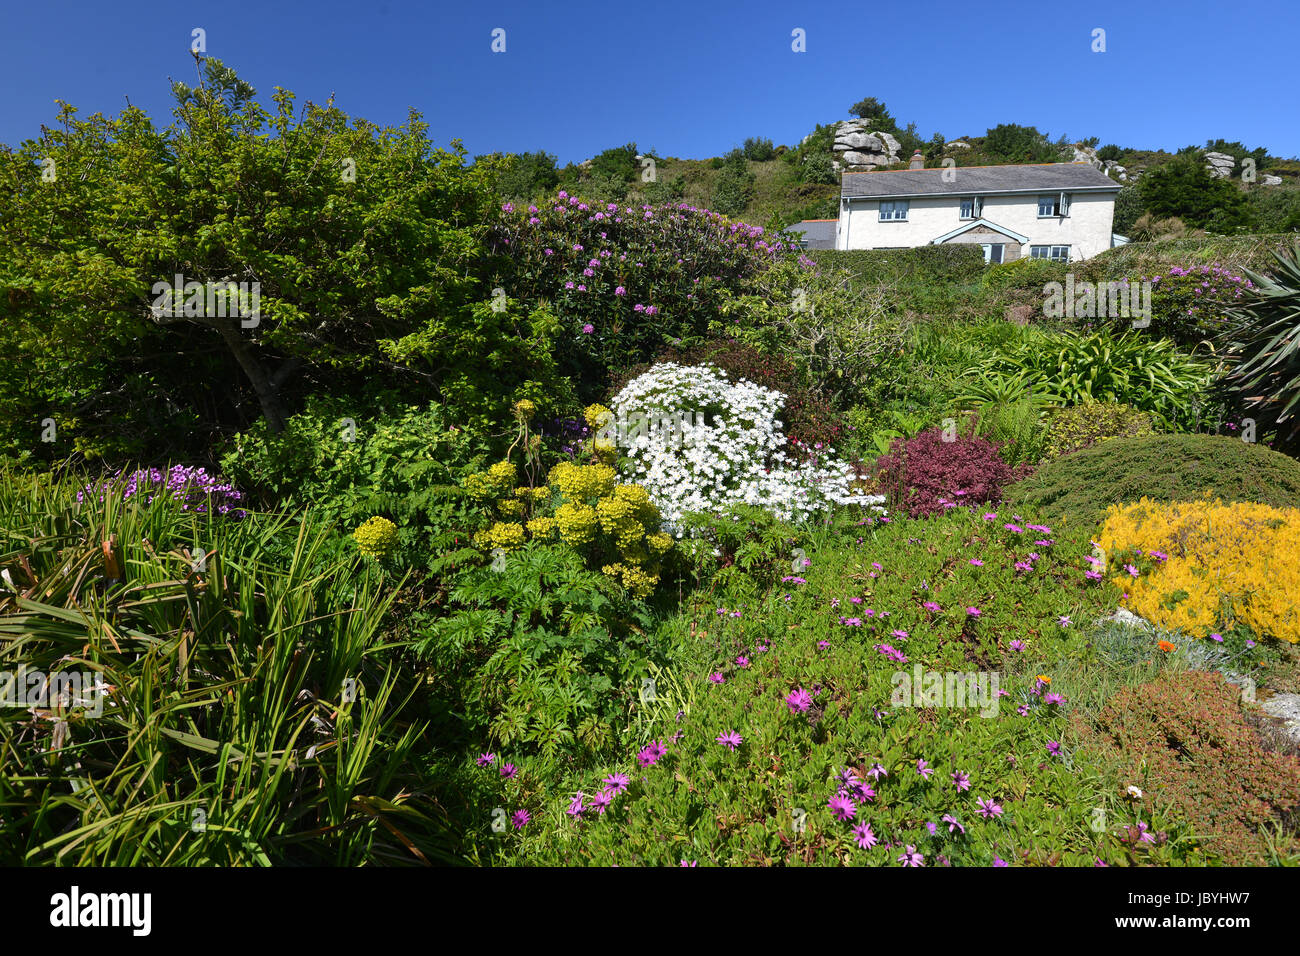 Üppige Vegetation in Bryher, Scilly Islea. Stockbild